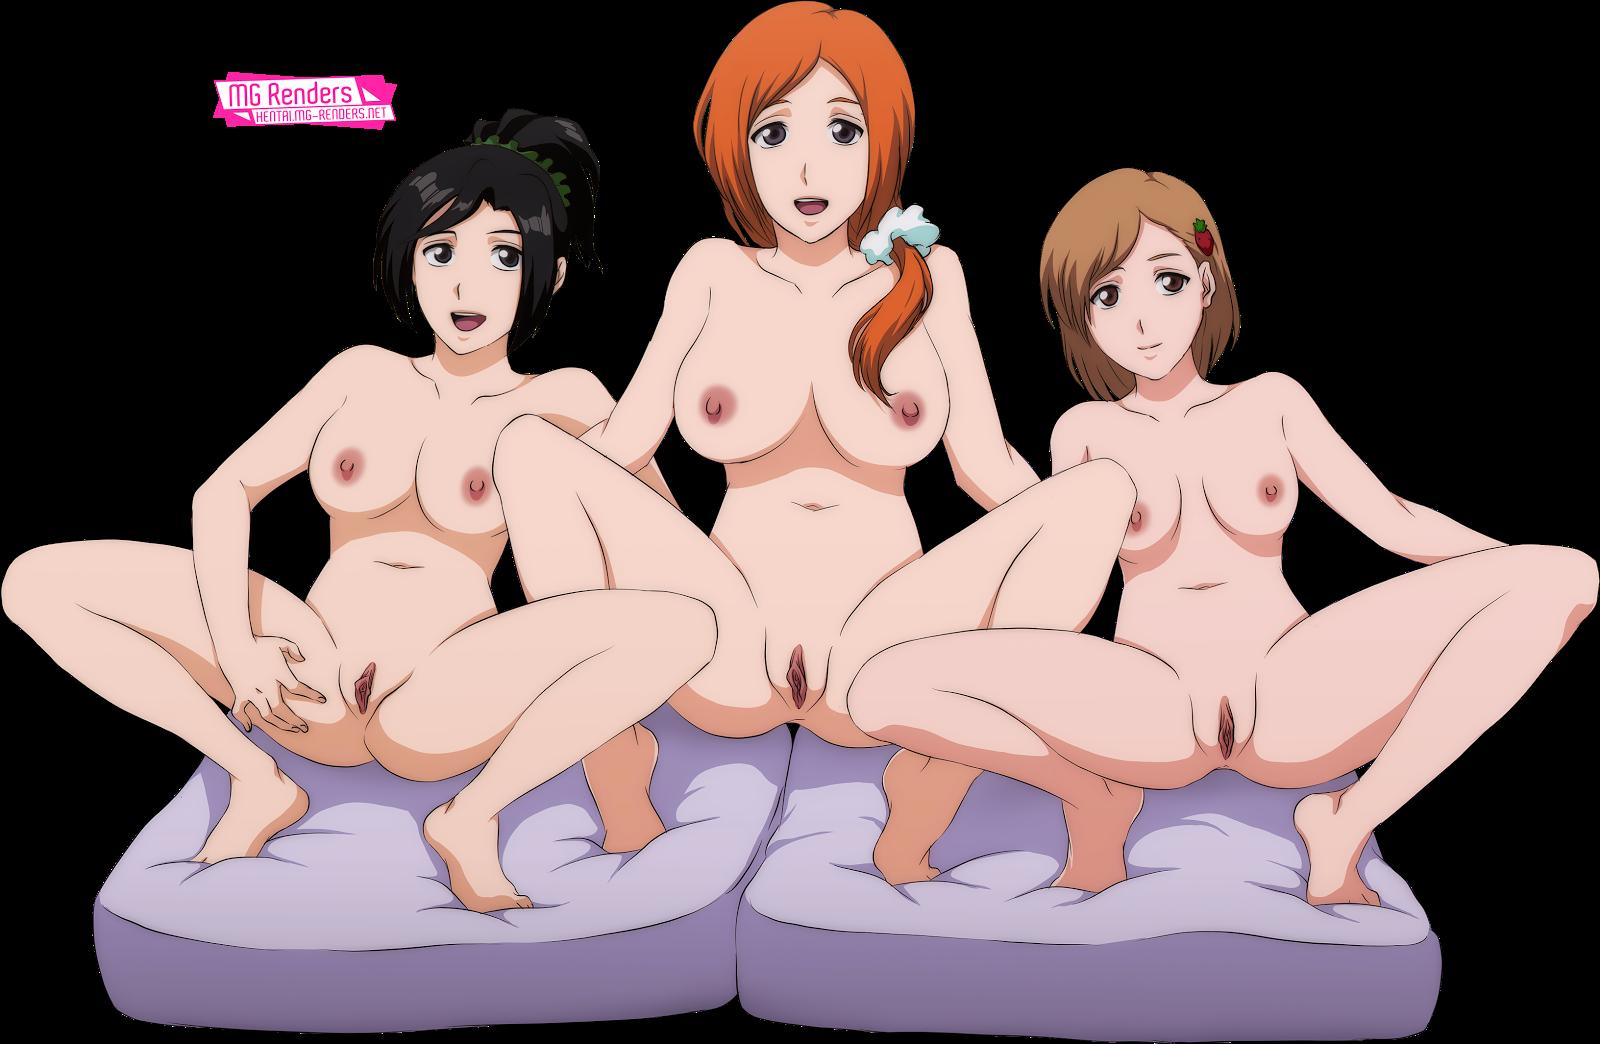 Tags: Image, Picture, Render, Anime, Hentai Barefoot, Brown hair, Feet, Inoue Orihime, Kurosaki Karin, Kurosaki Yuzu, Large Breasts, Naked, Ecchi, 裸, Nipples, No bra, No panties, Orange hair, Ponytail, Spread Legs, Vagina, PNG